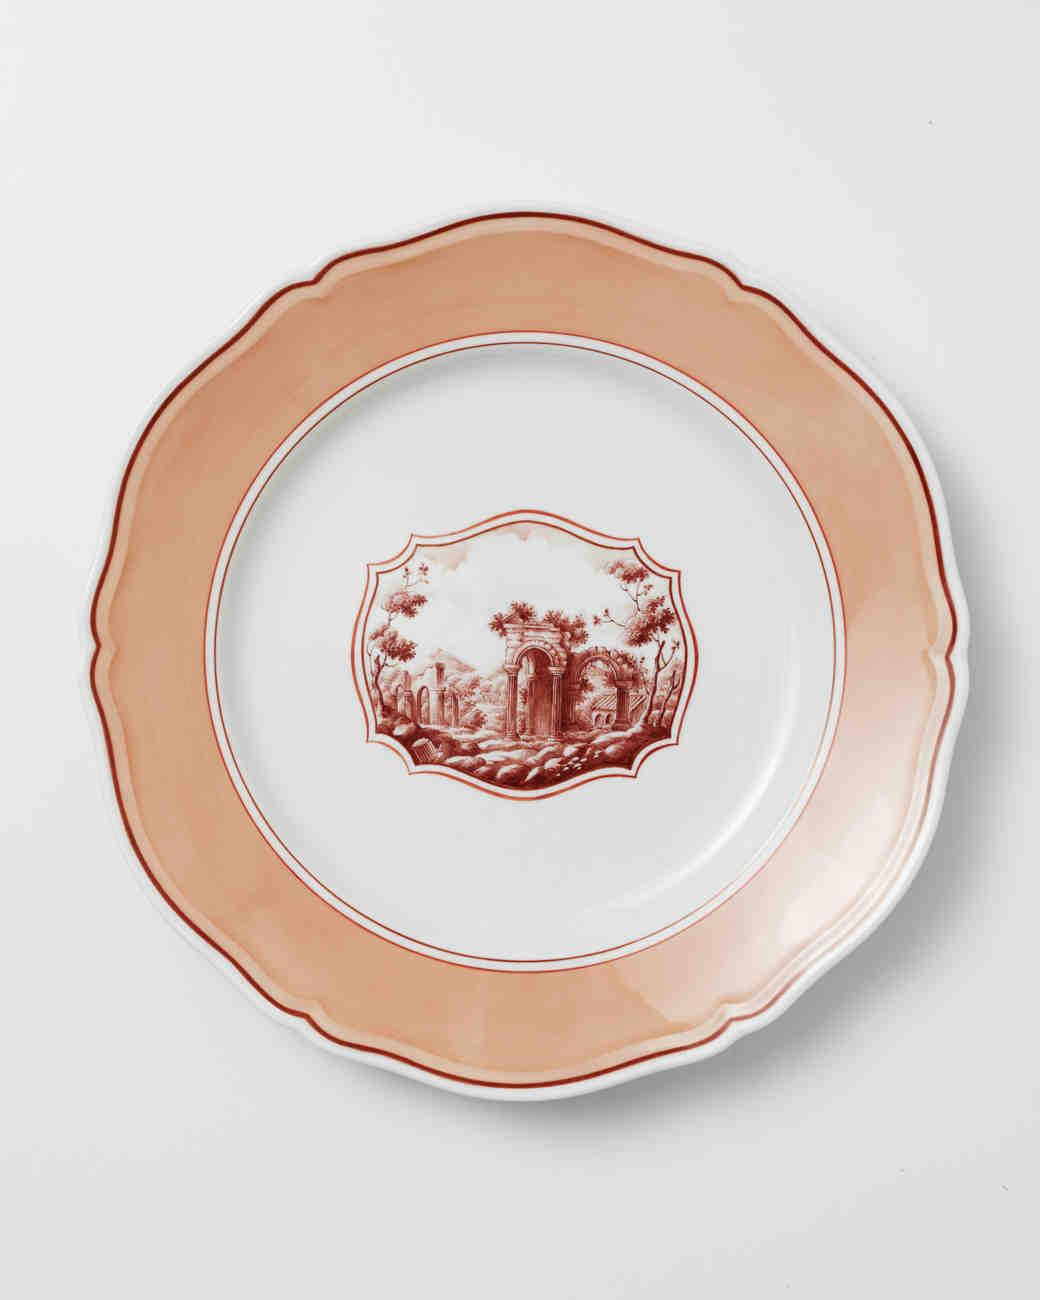 china-registry-vintage-charm-richard-ginori-toscana-dinnerware-006-d111317-1014.jpg